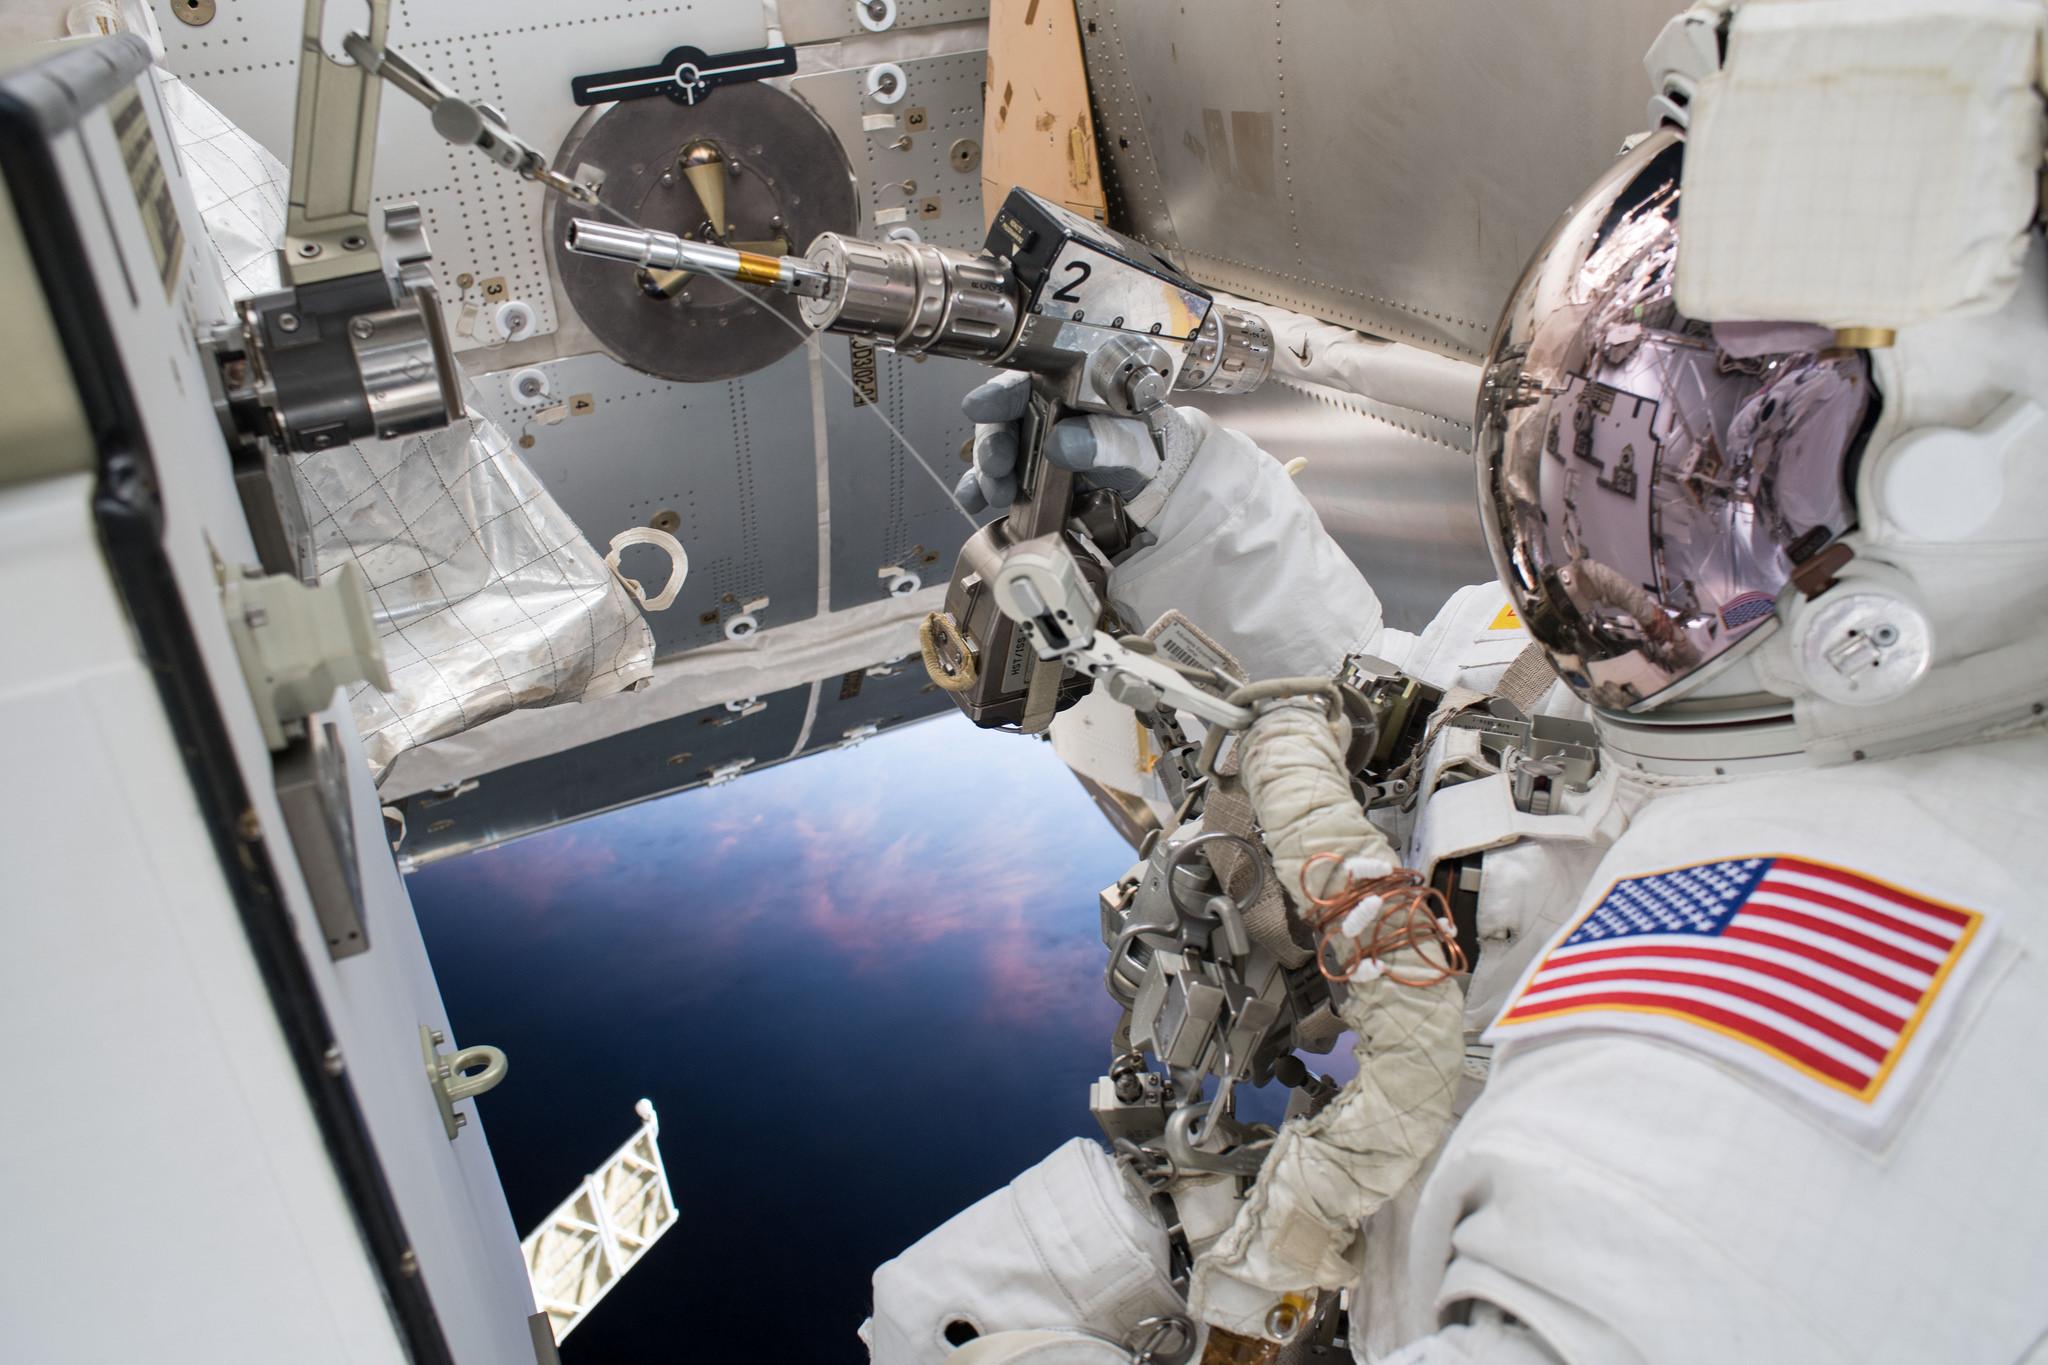 NASA astronaut Drew Feustel works to swap thermal control gear during U.S. EVA-50. Credit: NASA